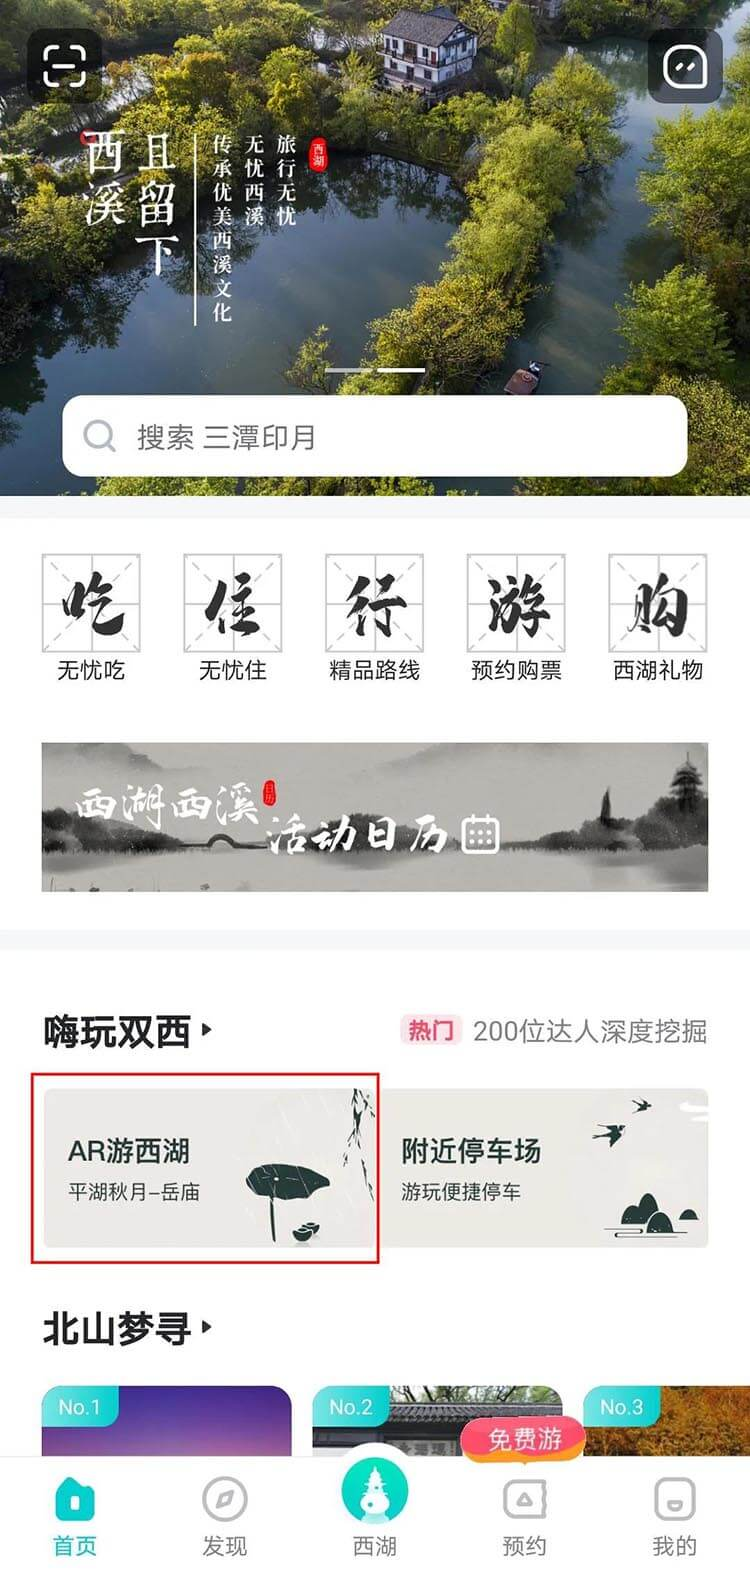 Hangzhou West Lake AR